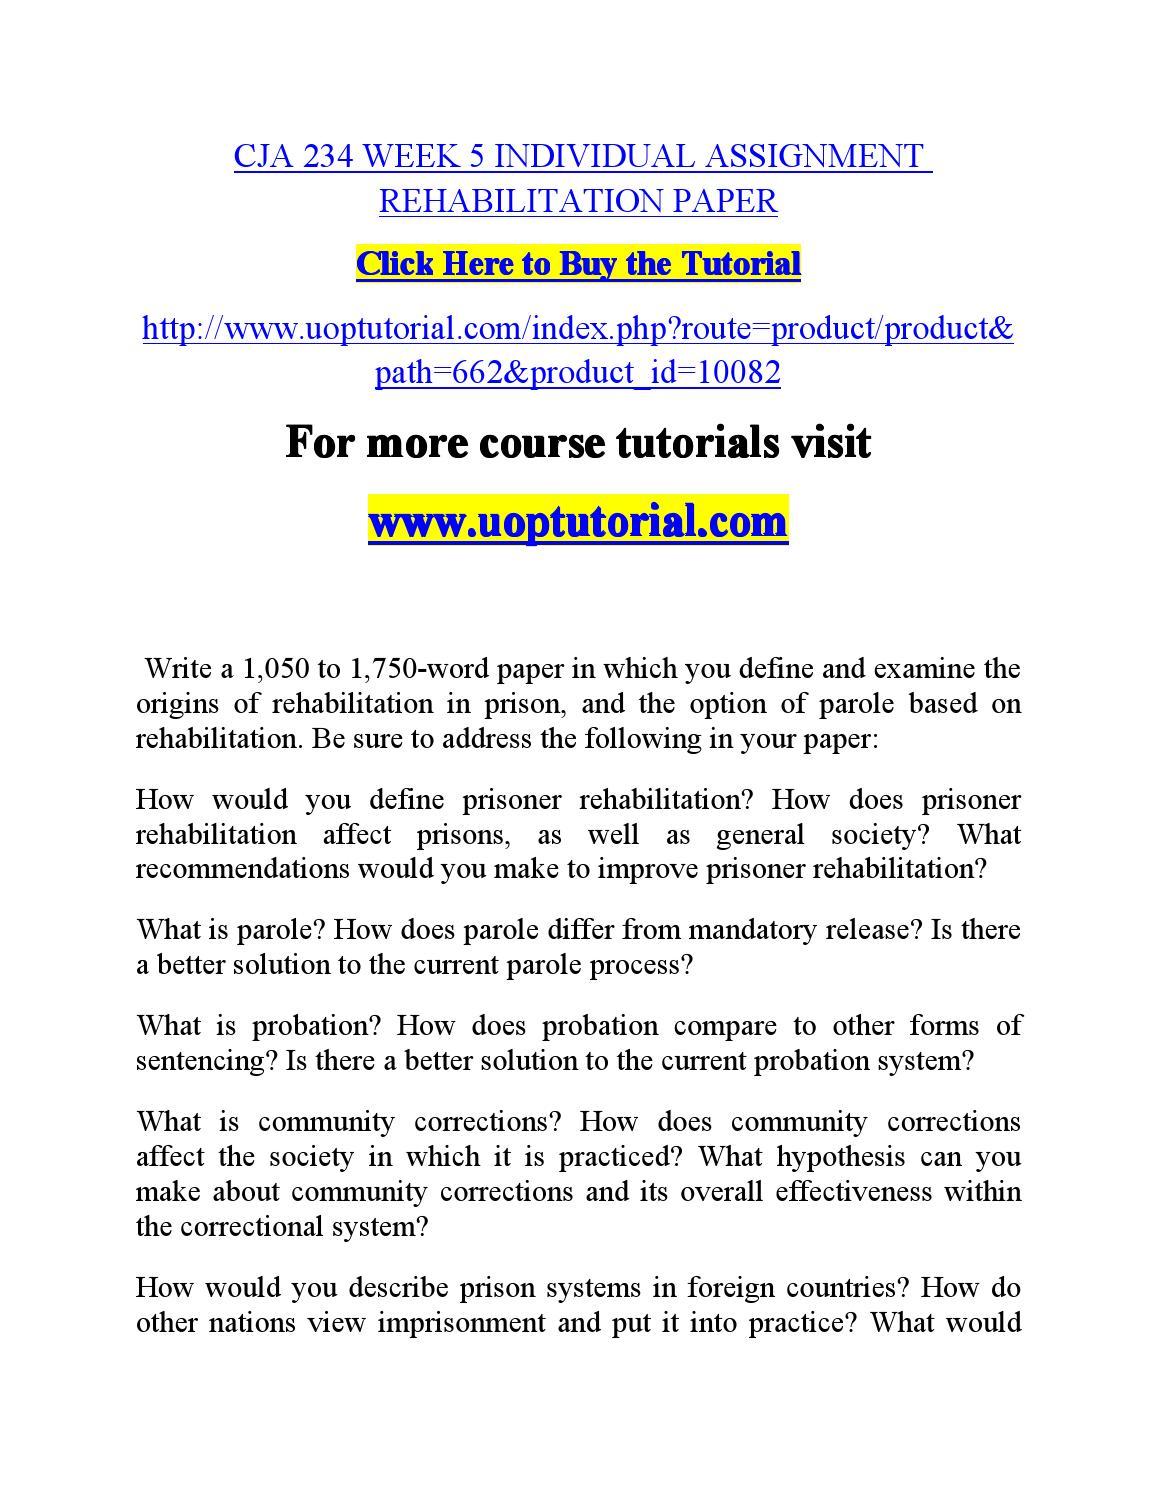 001 Essay Example Punishment Or Rehabilitation Page 1 Awesome Full